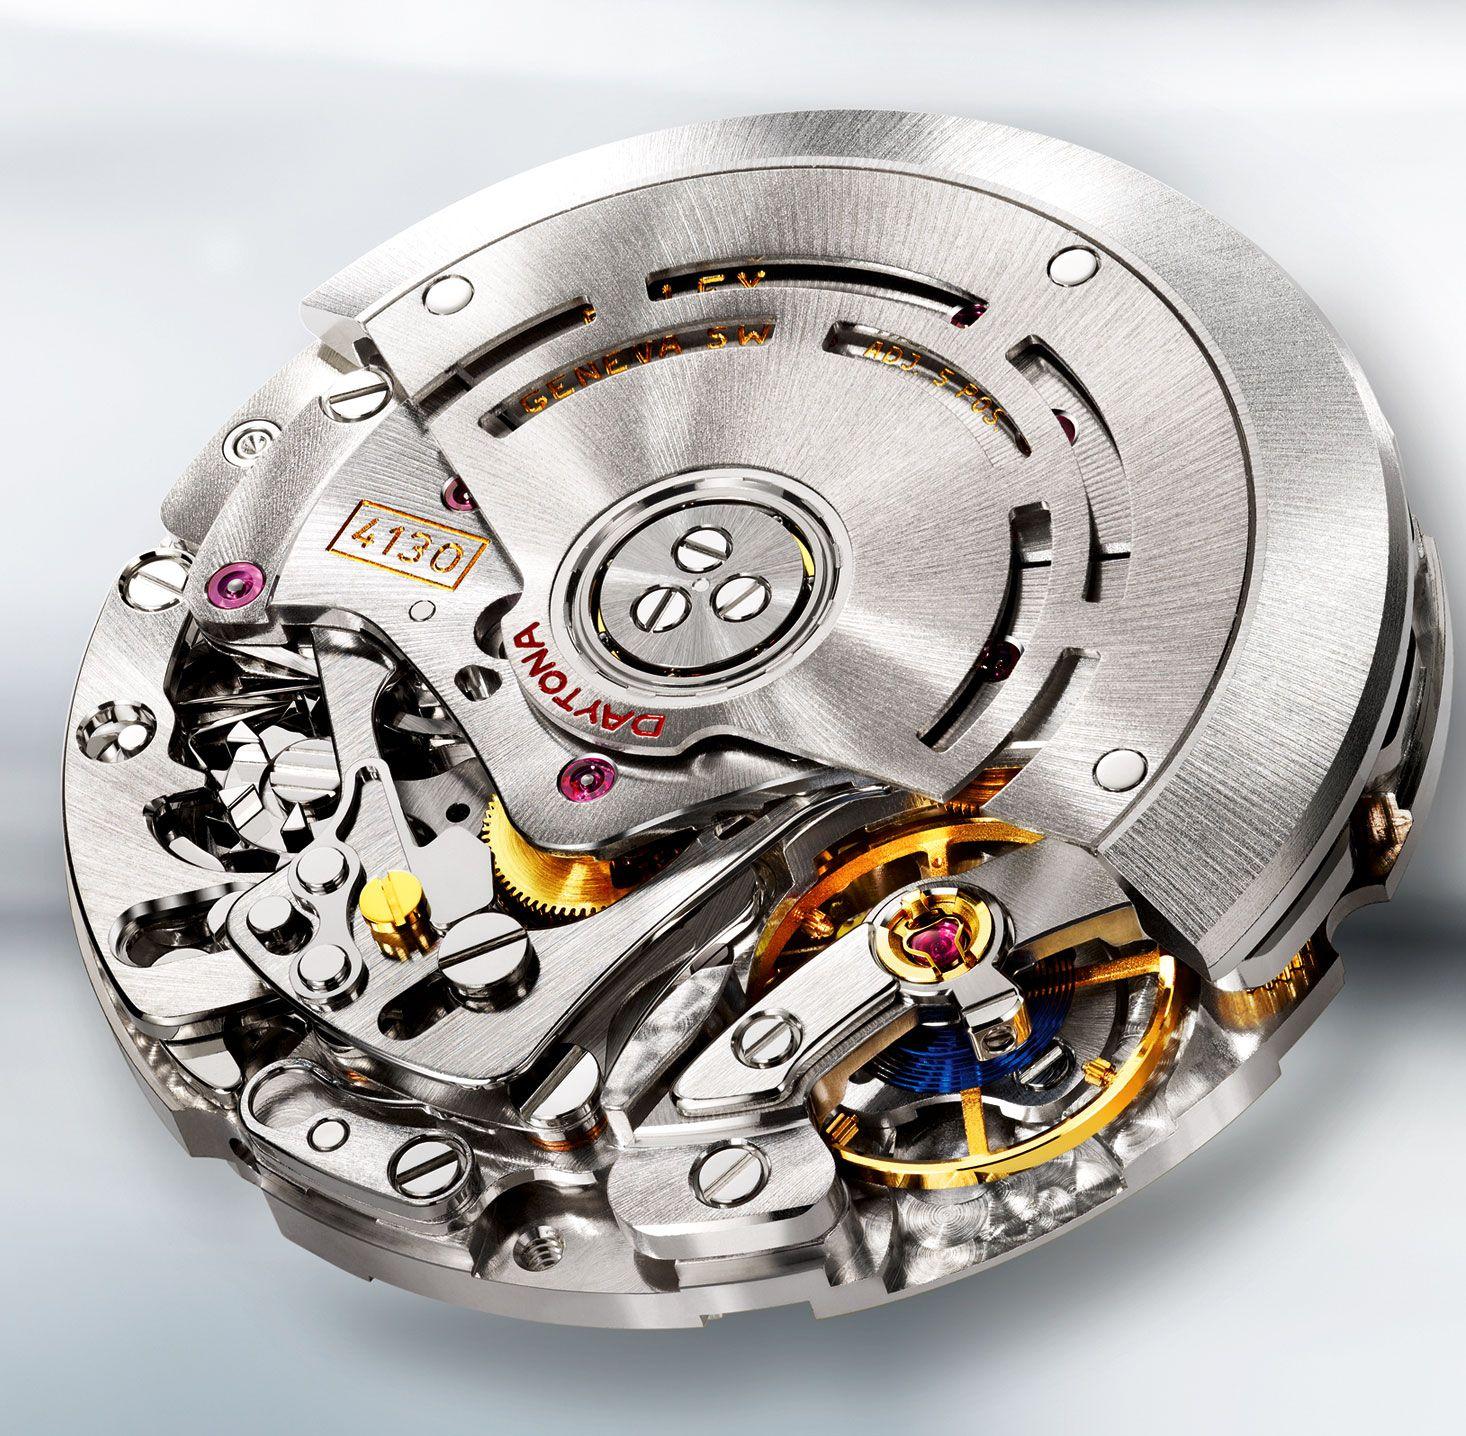 c1515e4a13c eta movement Rolex Daytona